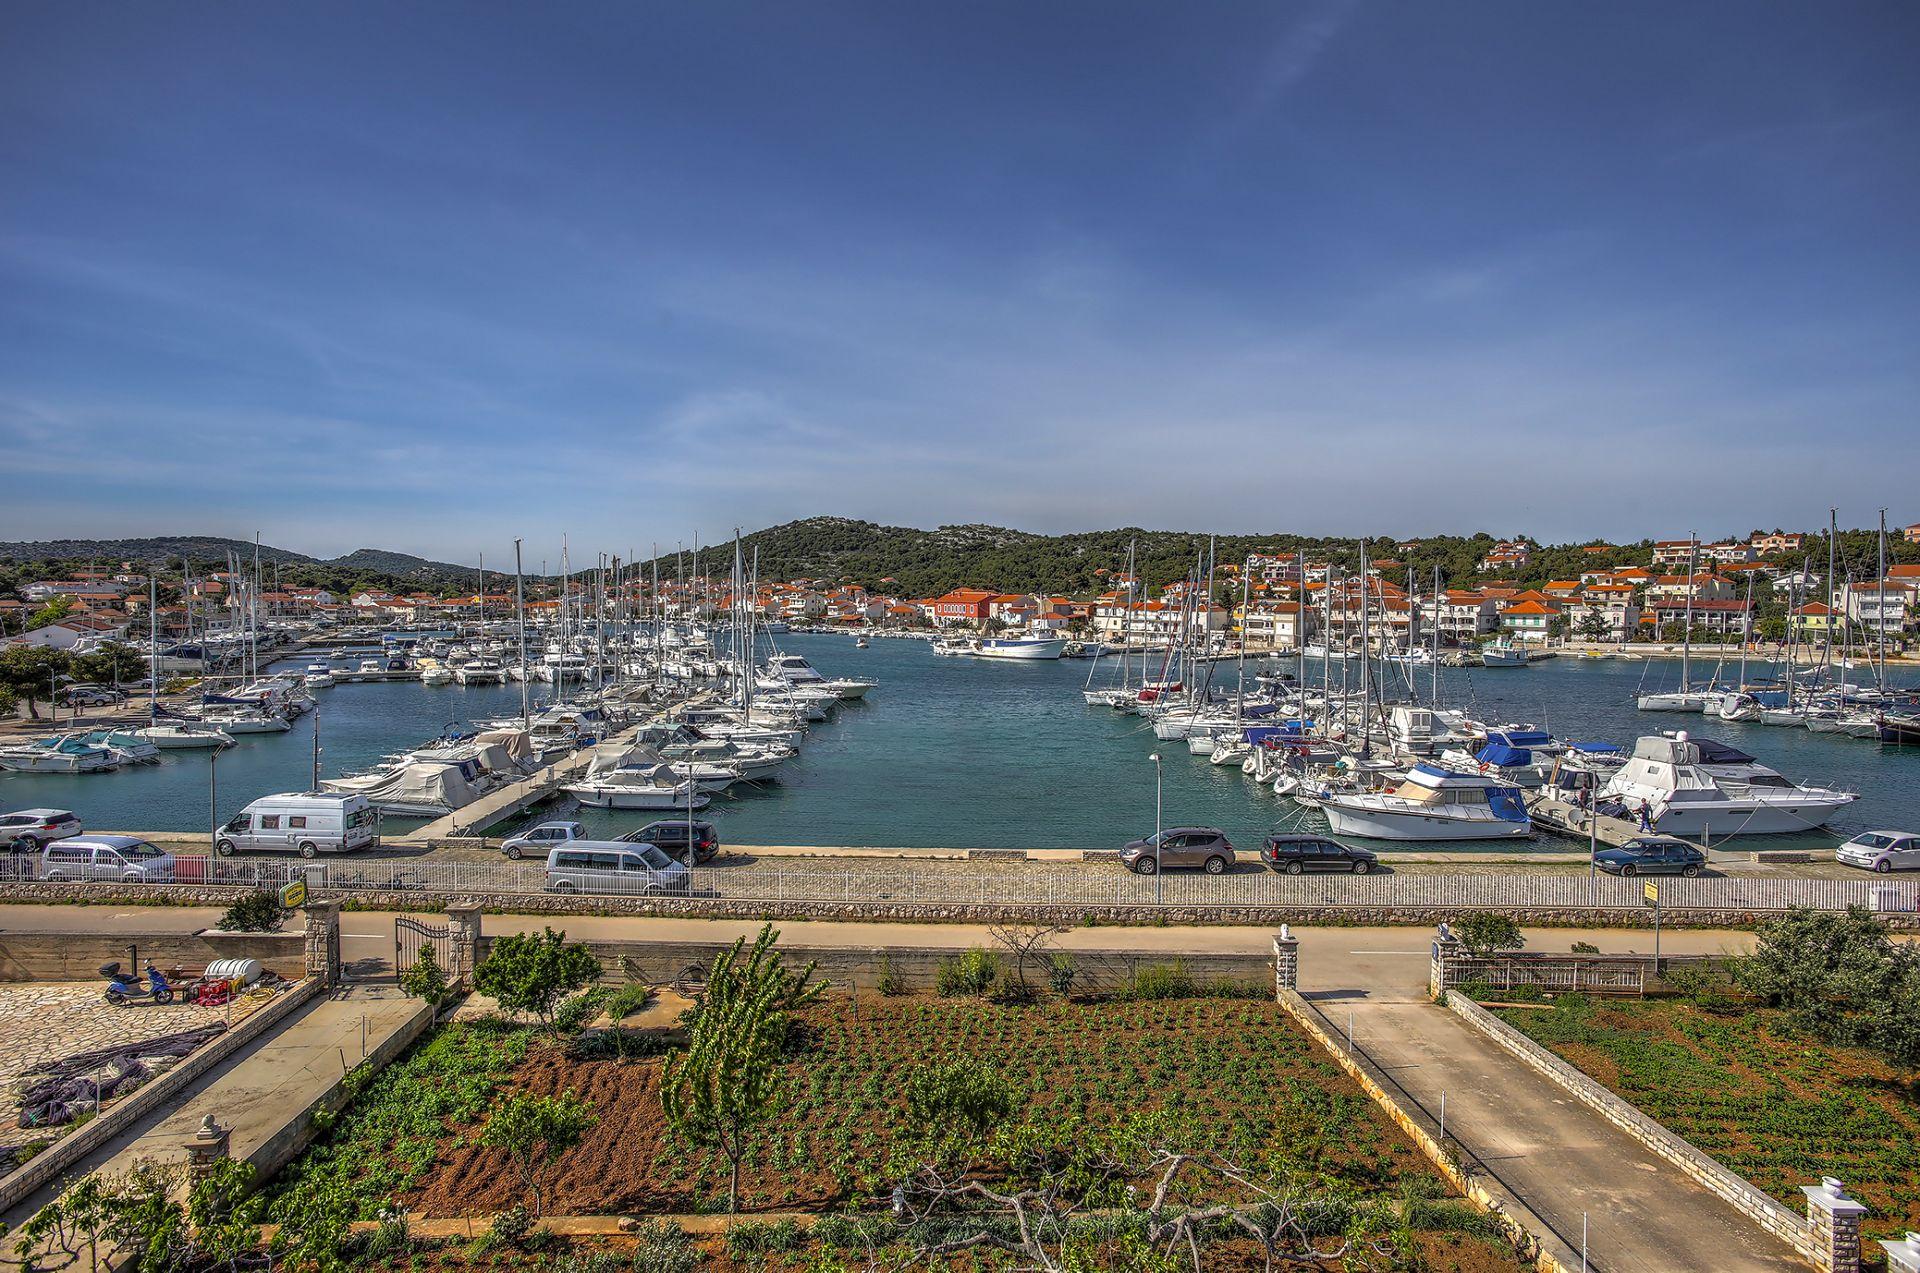 5409 - Jezera - Apartments Croatia - A5(4): terrace view